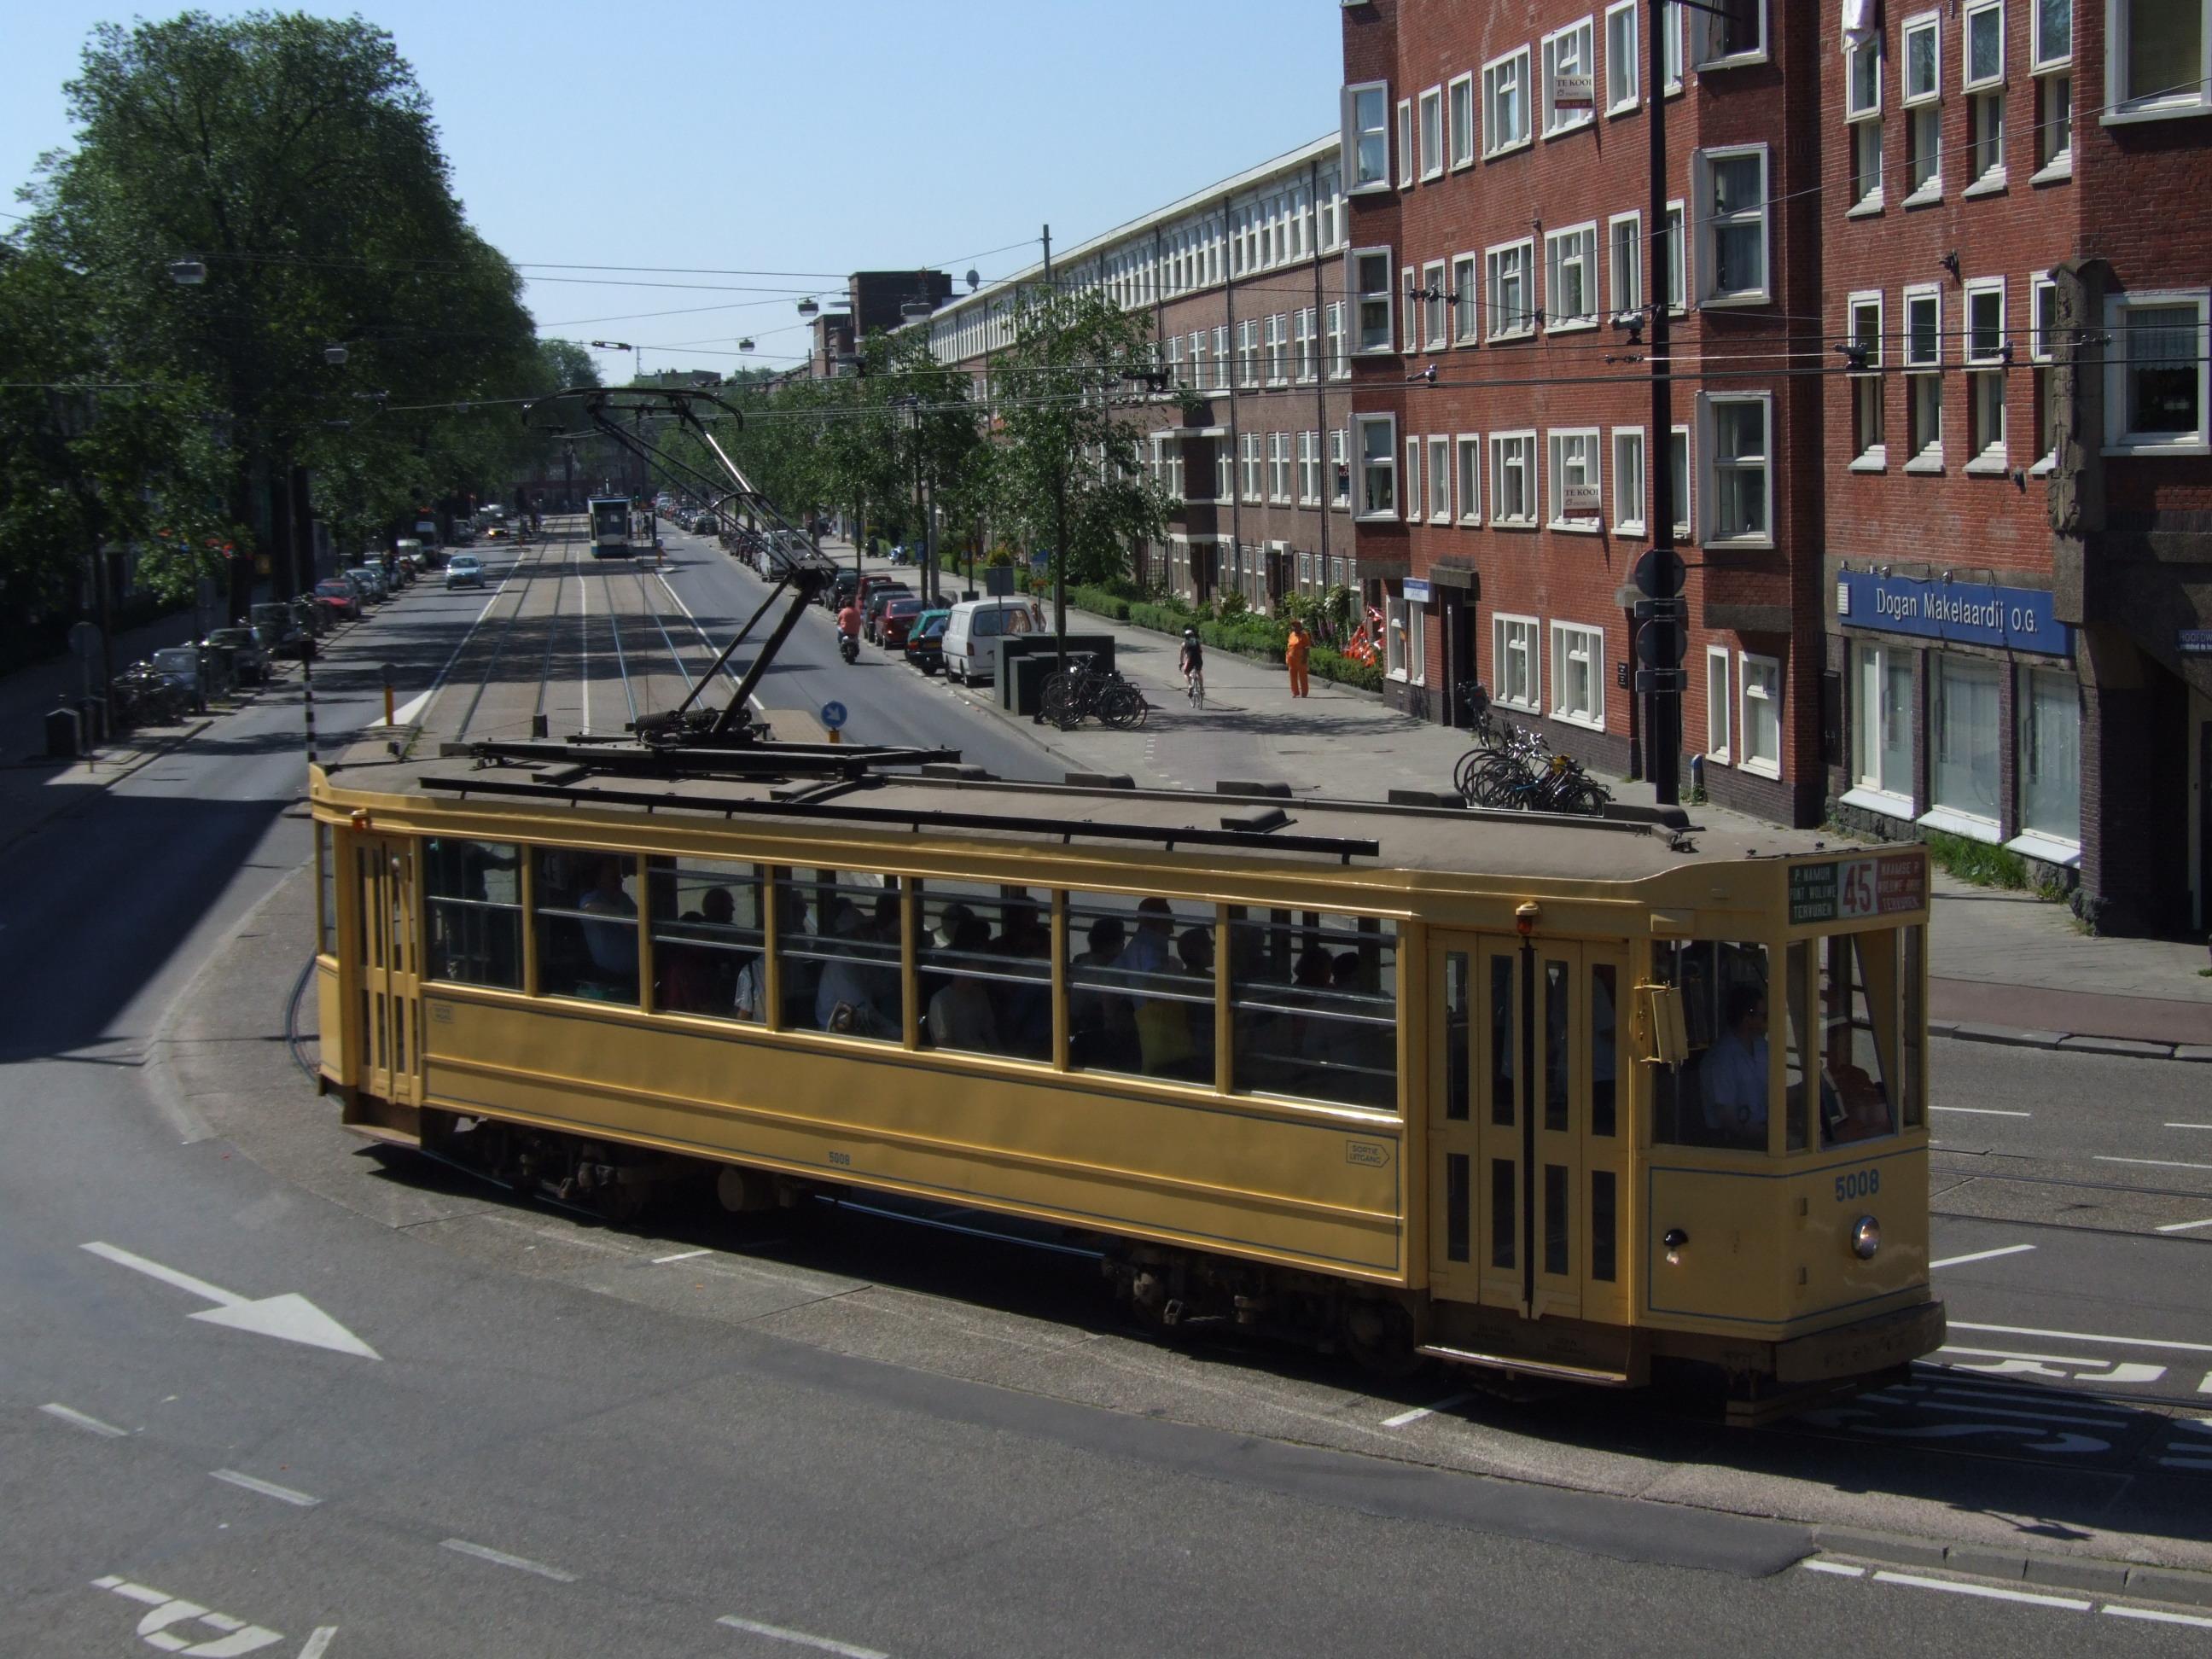 6: Kopenhagen Tram 575 with trailor 1578 came from Danish Sporvejsmuseet  Skjoldenæsholm, at Mercatorplain.